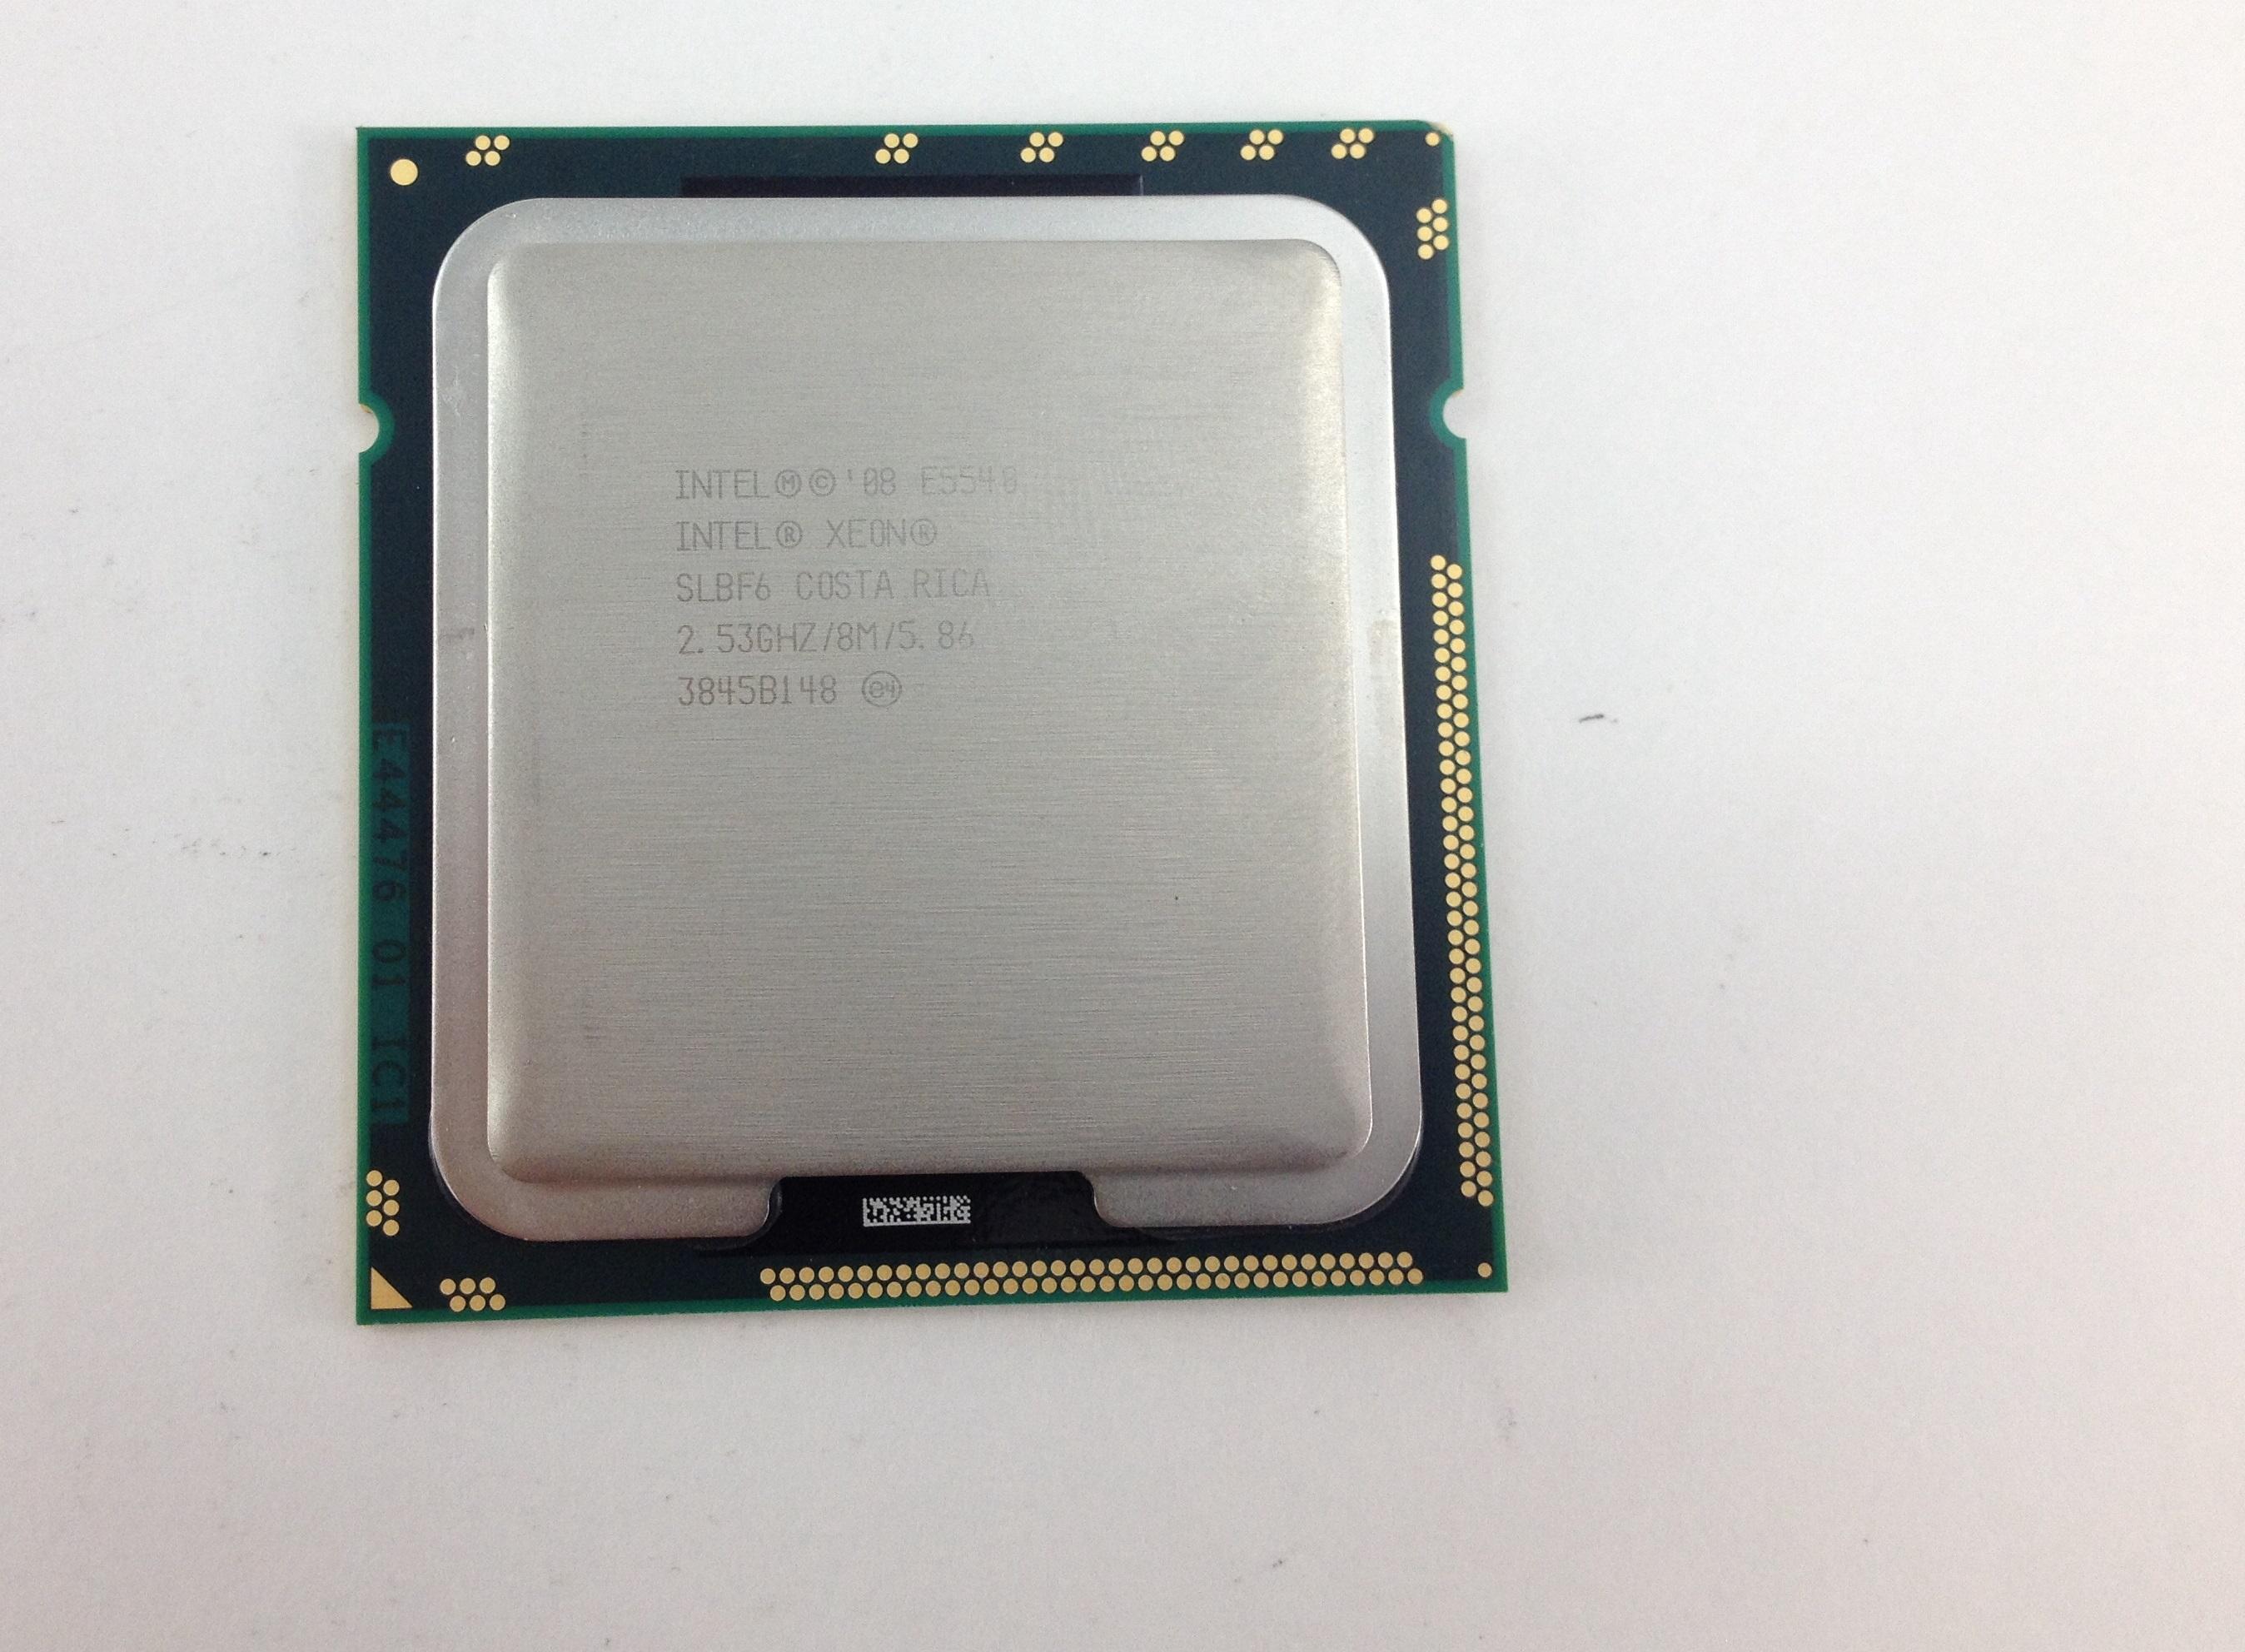 Matching Pair Intel Xeon E5540 SLBF6 2.53GHz Socket 1366 CPU Processor